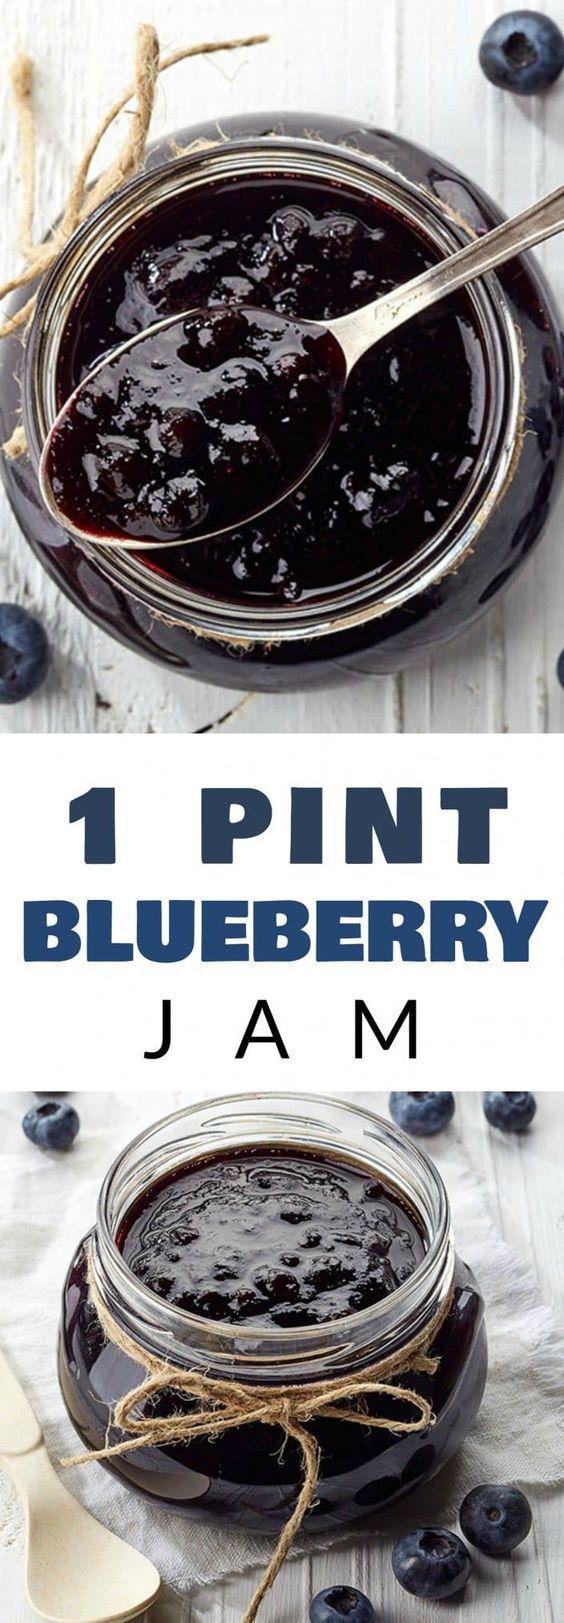 1 Pint Blueberry Jam